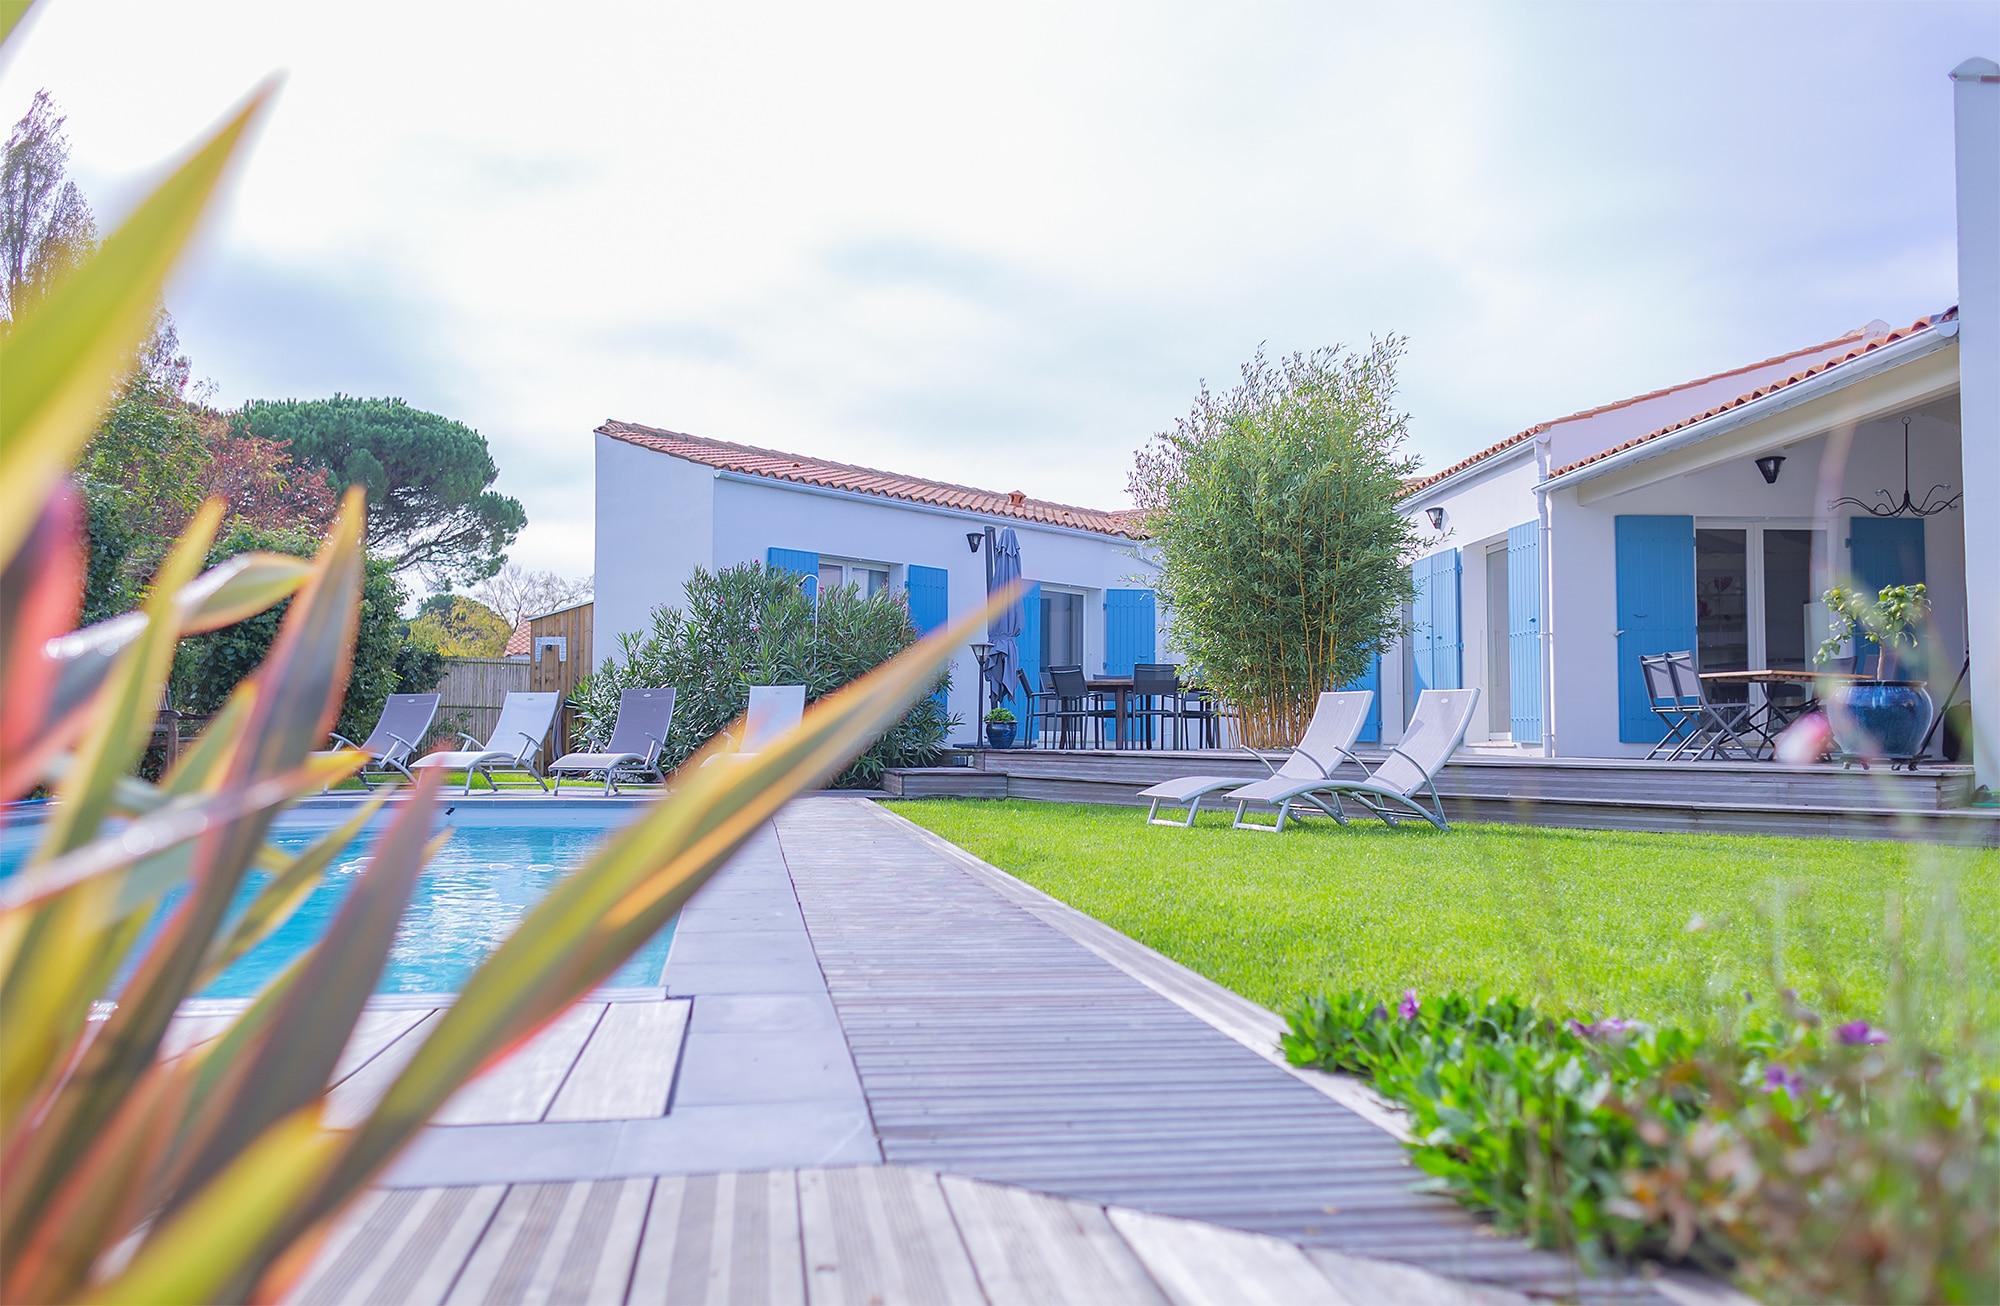 terrasse bois piscine maison ile d'oleron